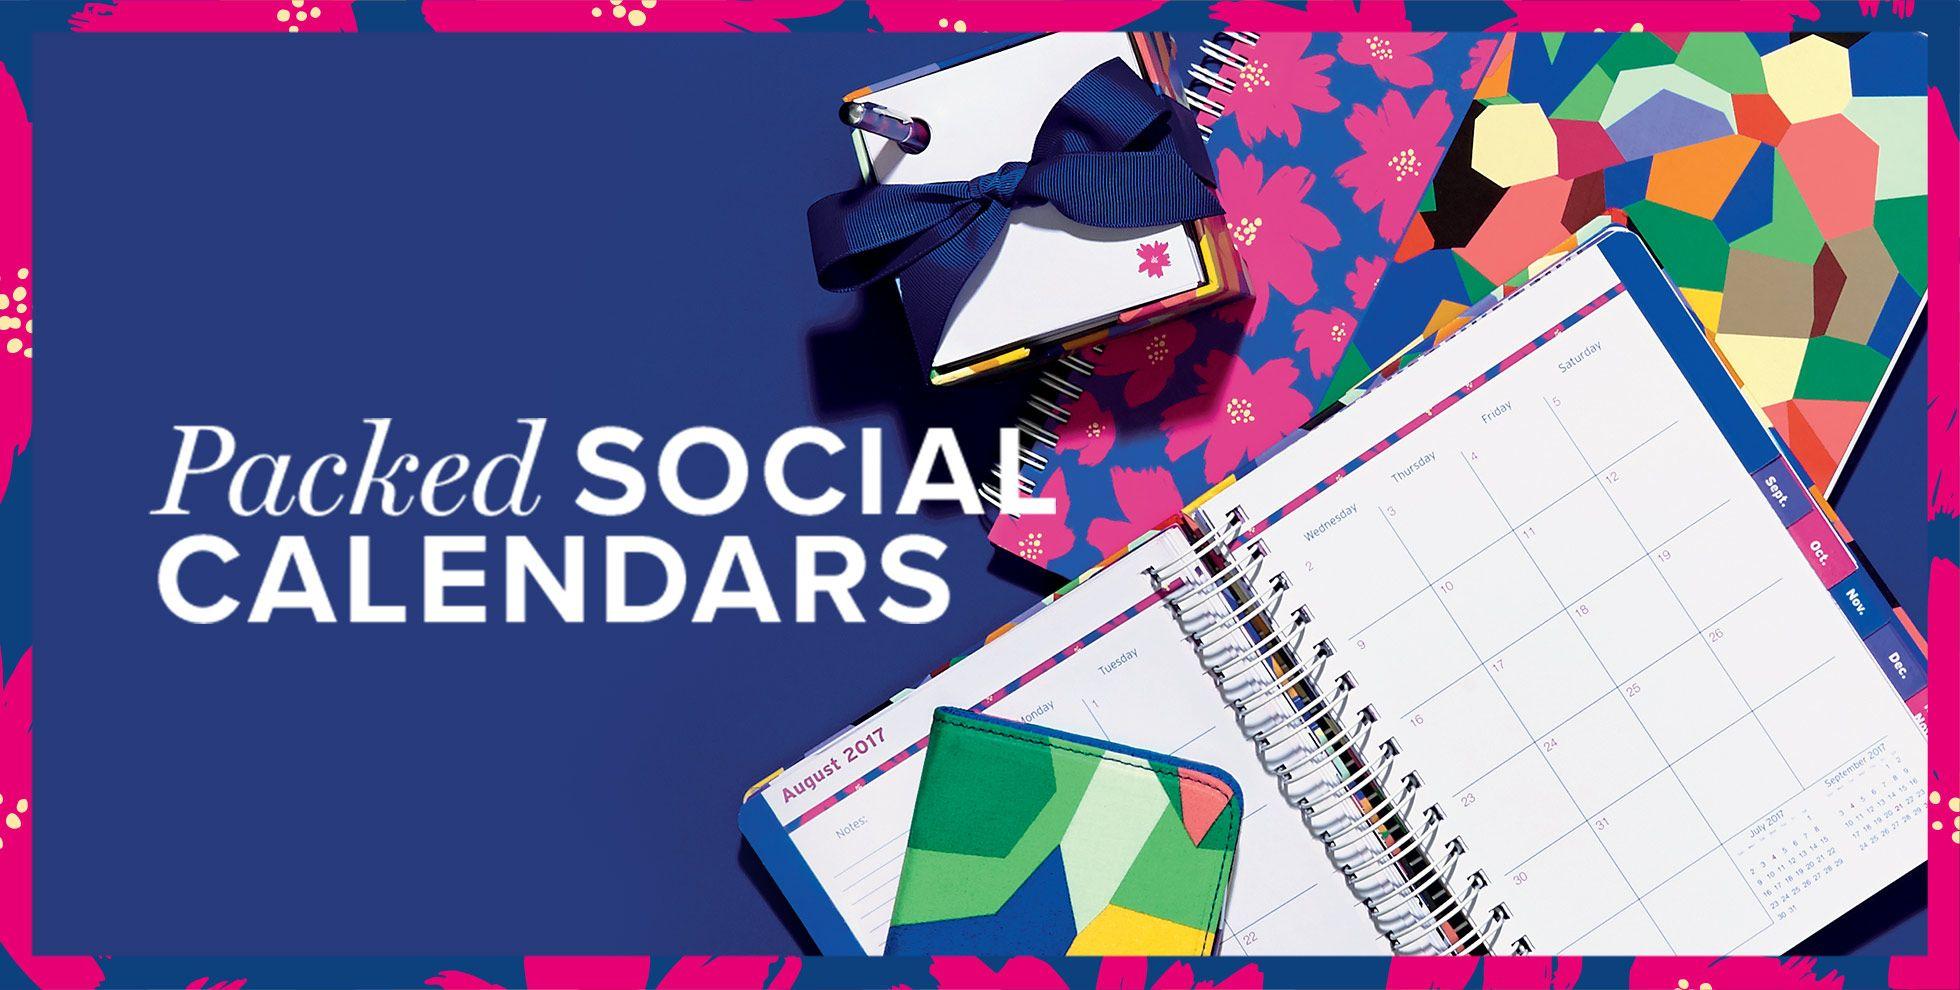 Packed social calendars